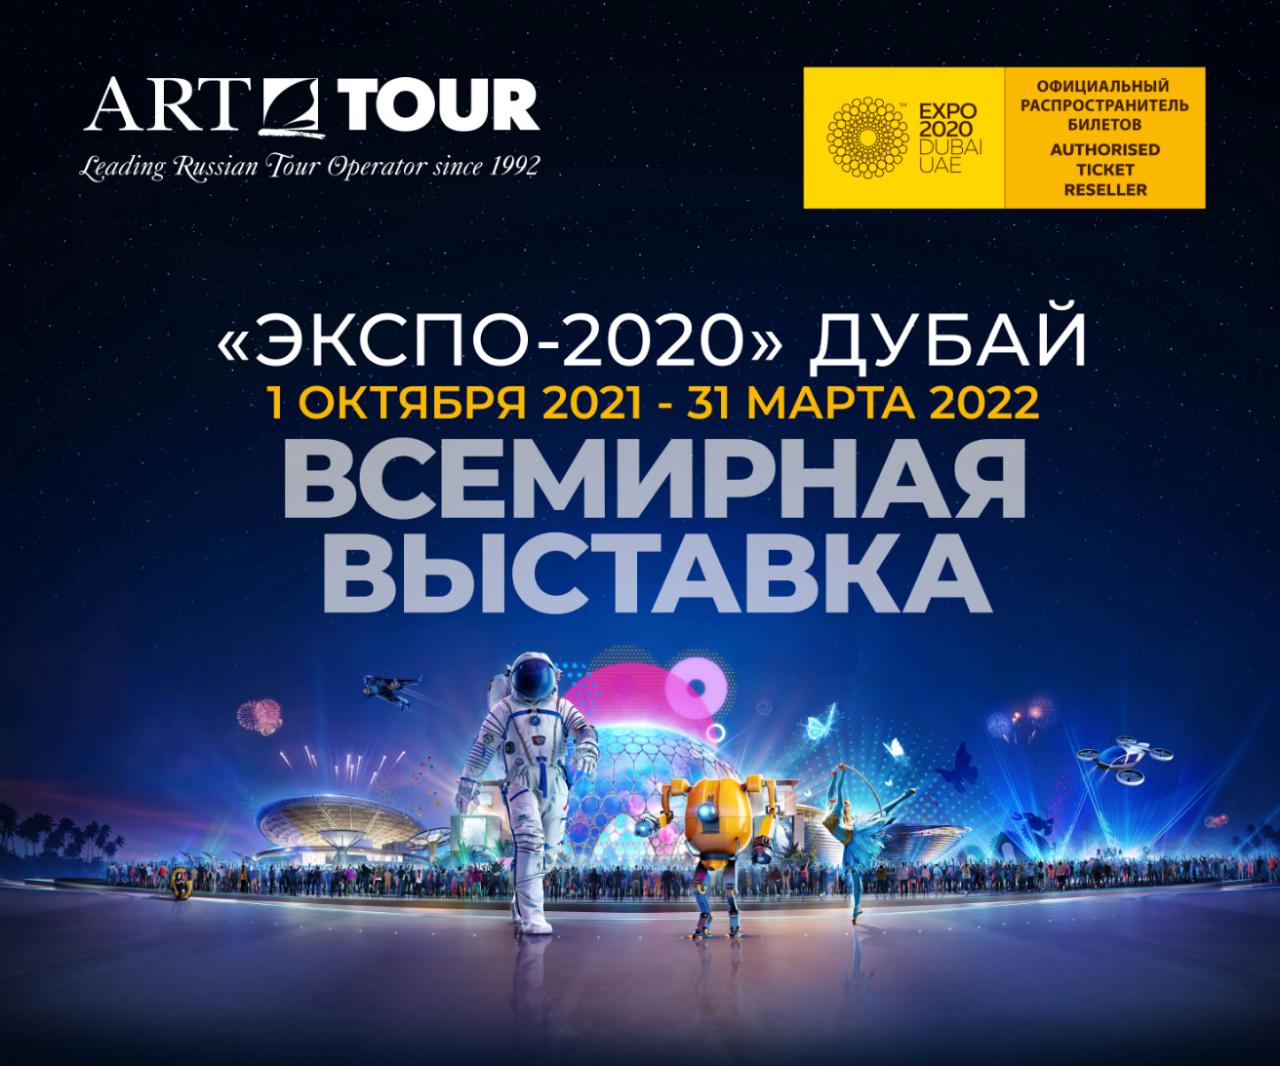 EXPO 2020 Party. «АРТ-ТУР» открыл продажу билетов